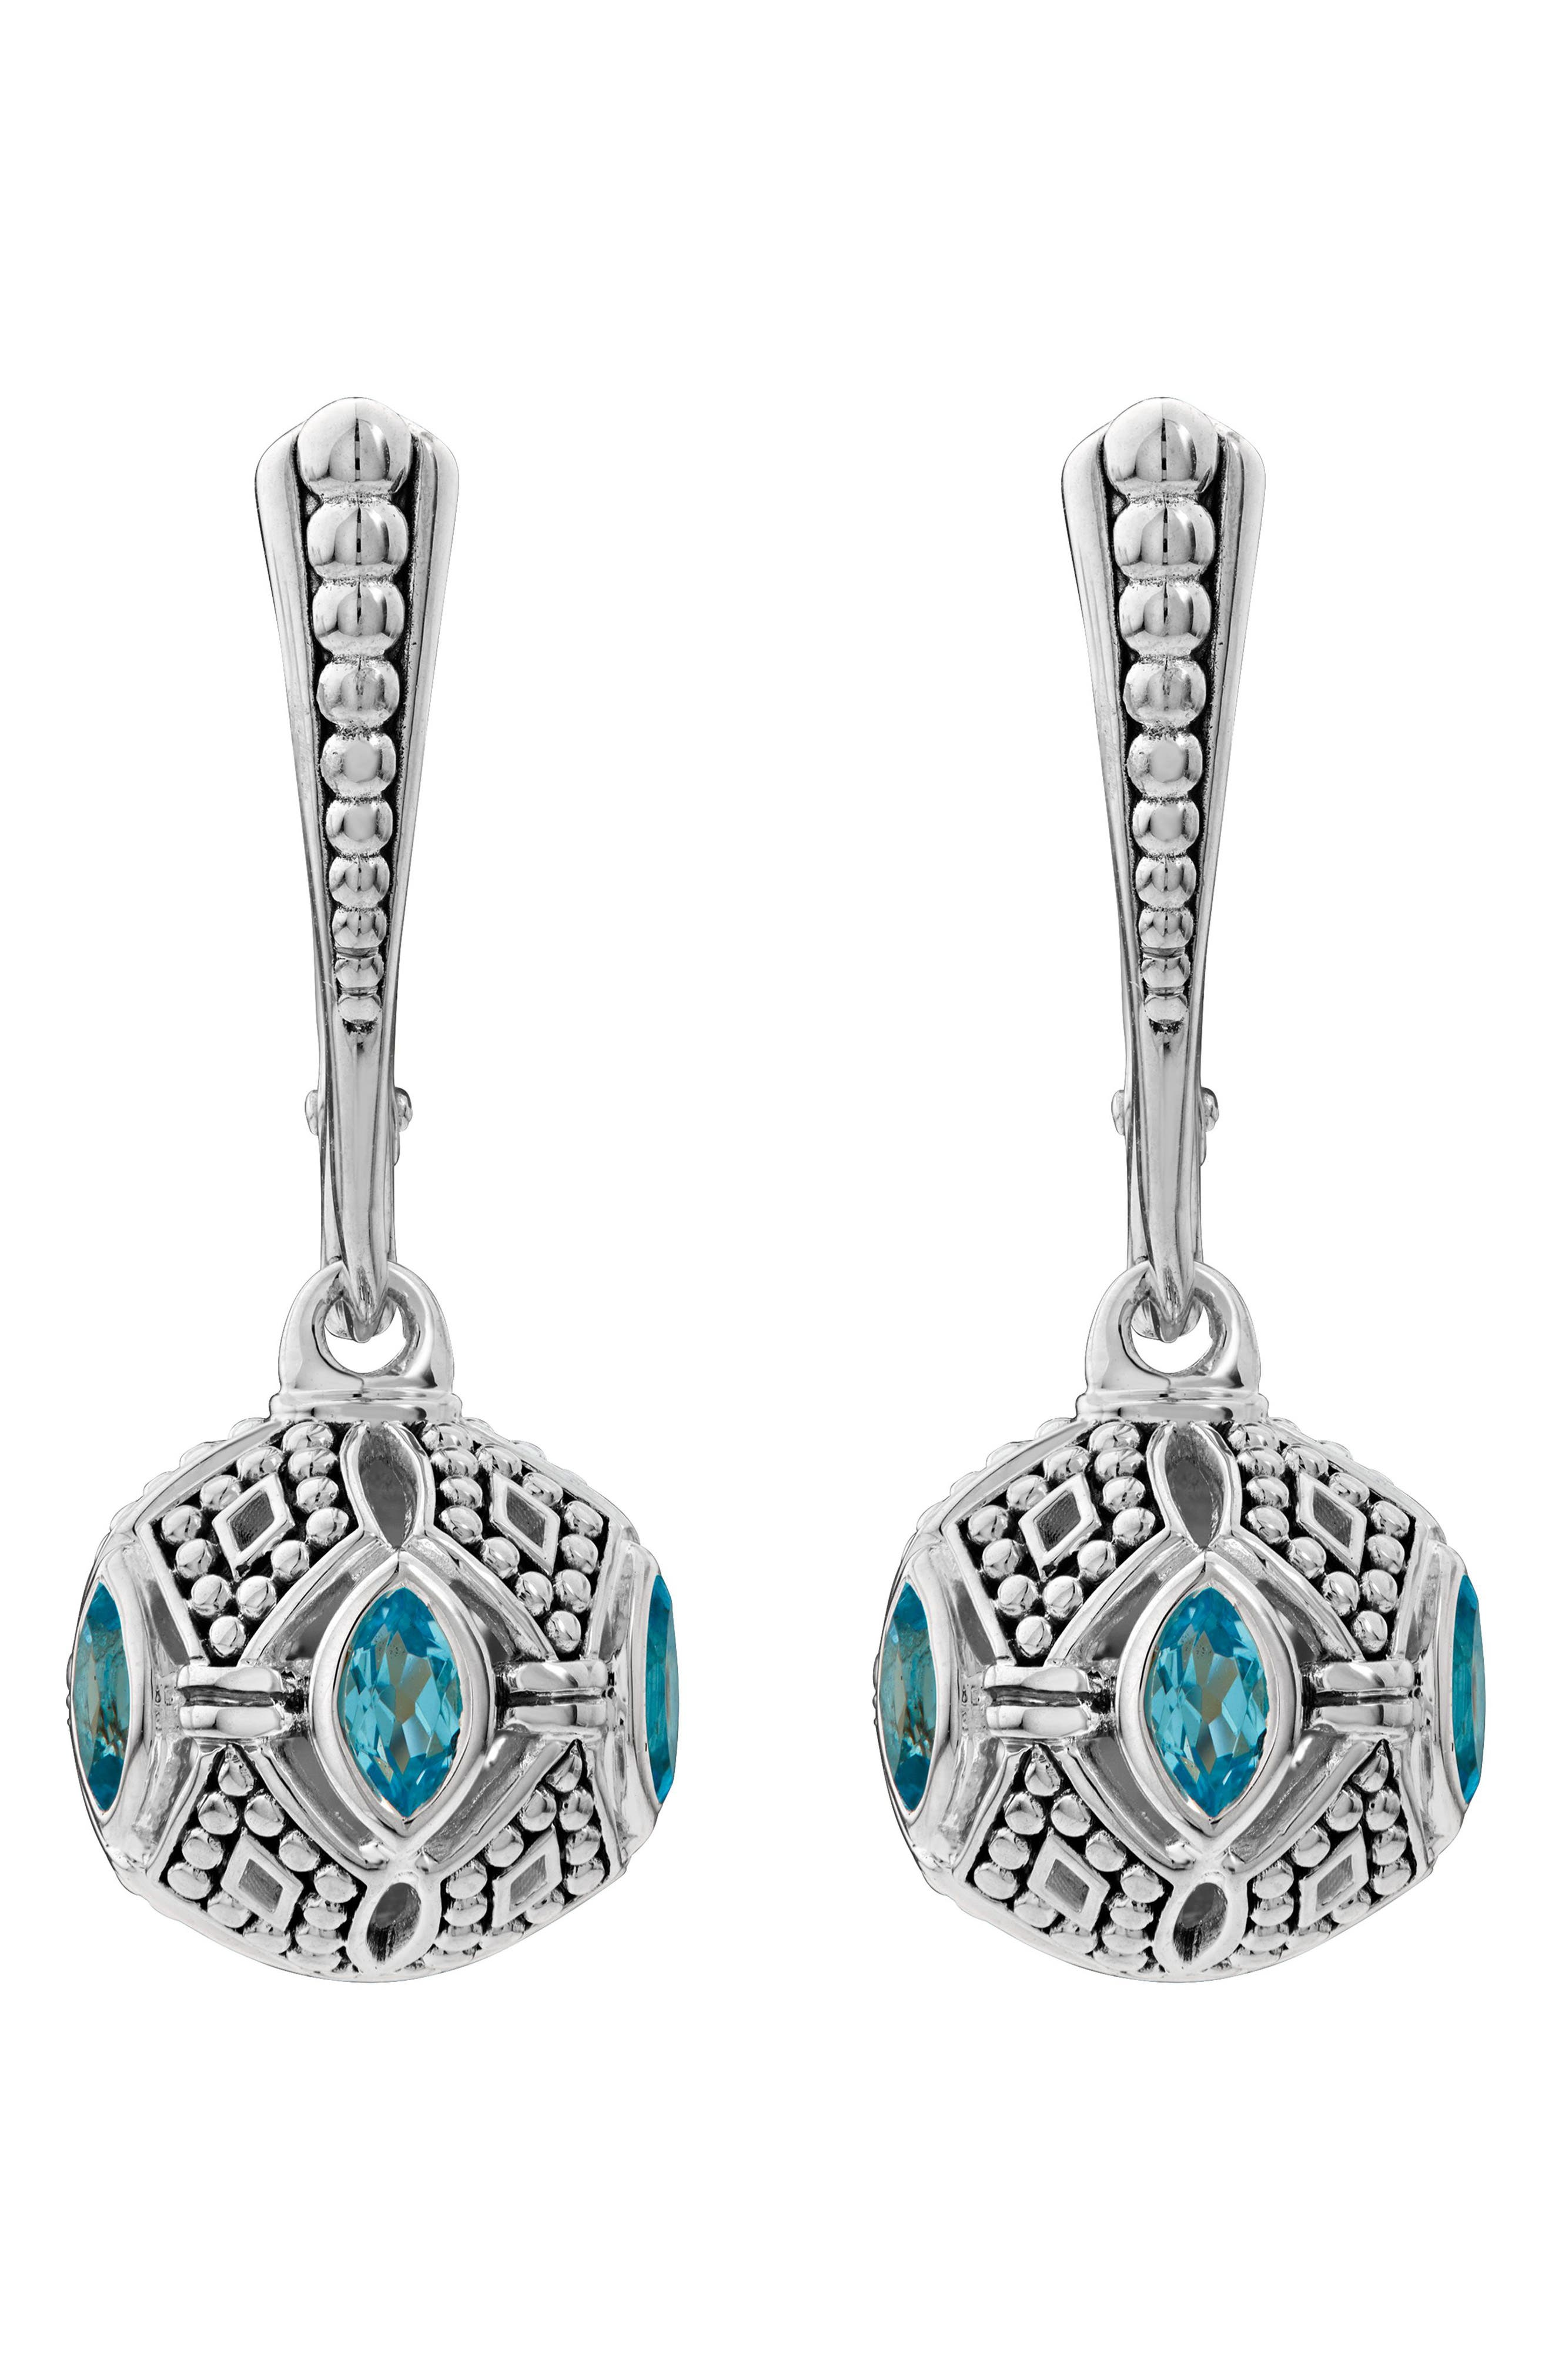 Caviar Talisman Marquee Leverback Earrings,                             Alternate thumbnail 2, color,                             Silver/ 18K Gold/ Blue Topaz